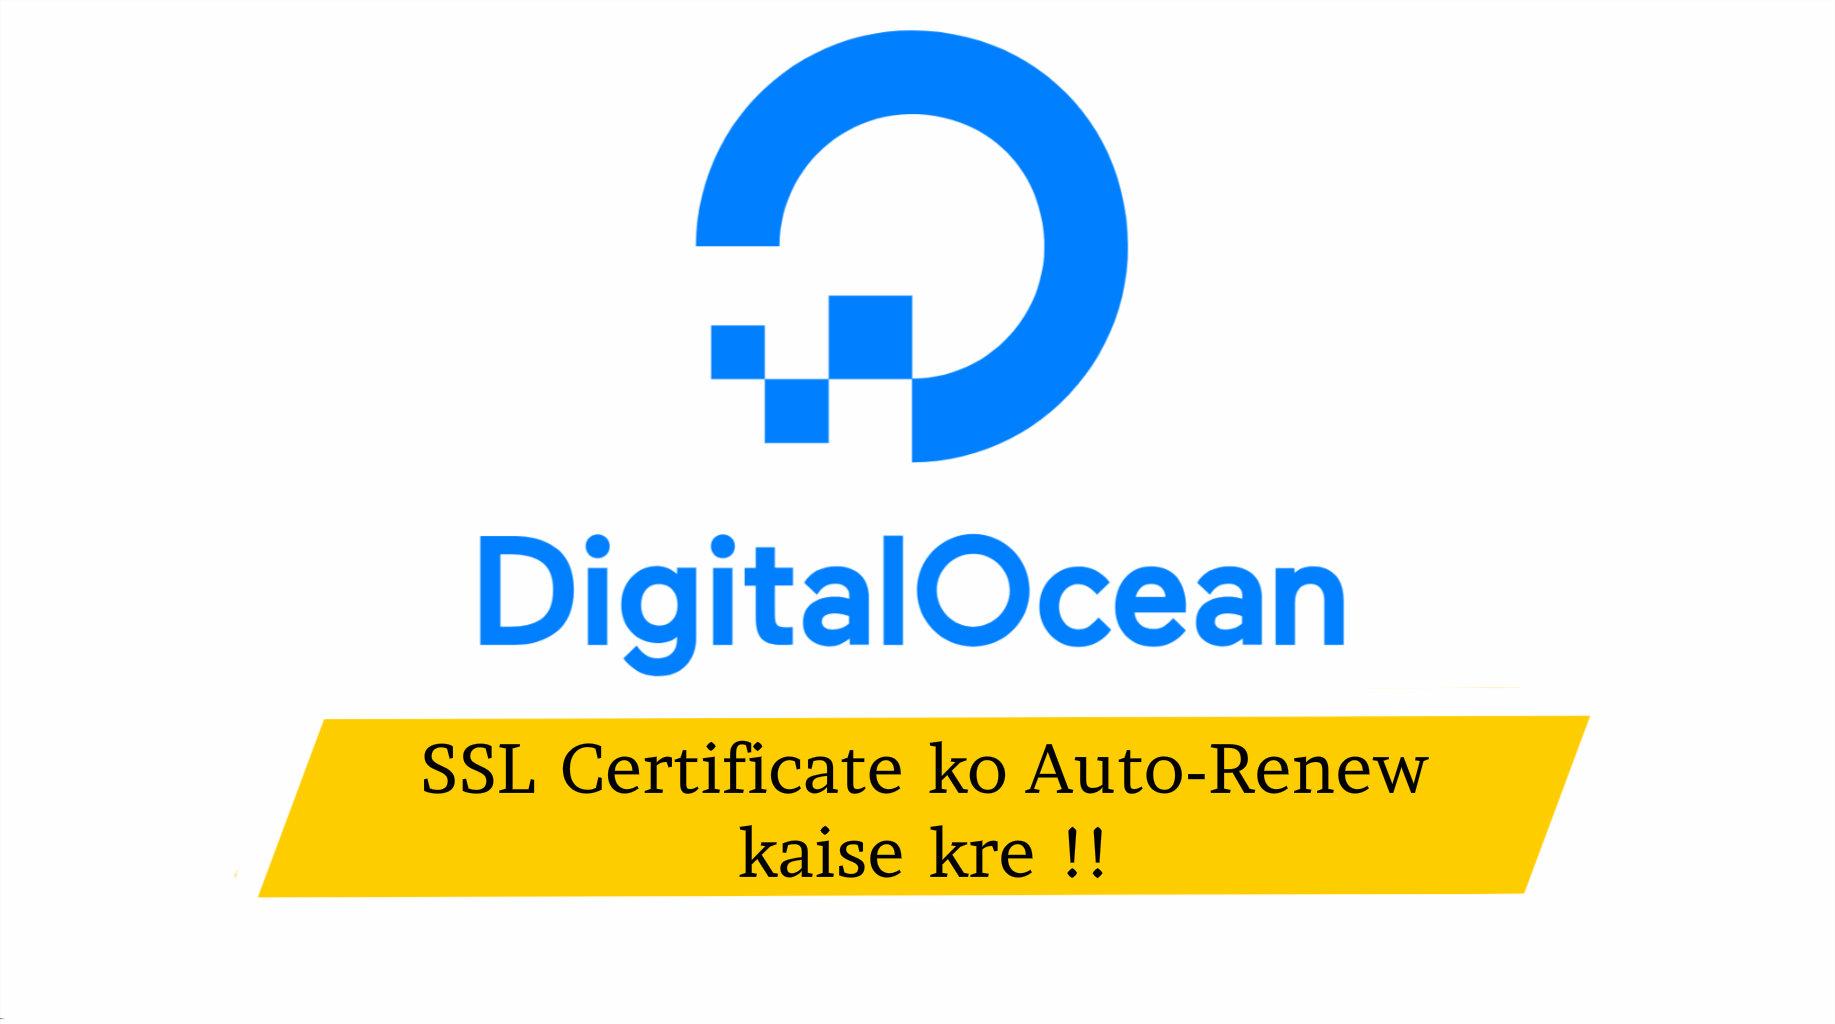 DigitalOcean SSL Certificate koAuto-Renew kaise kare !!